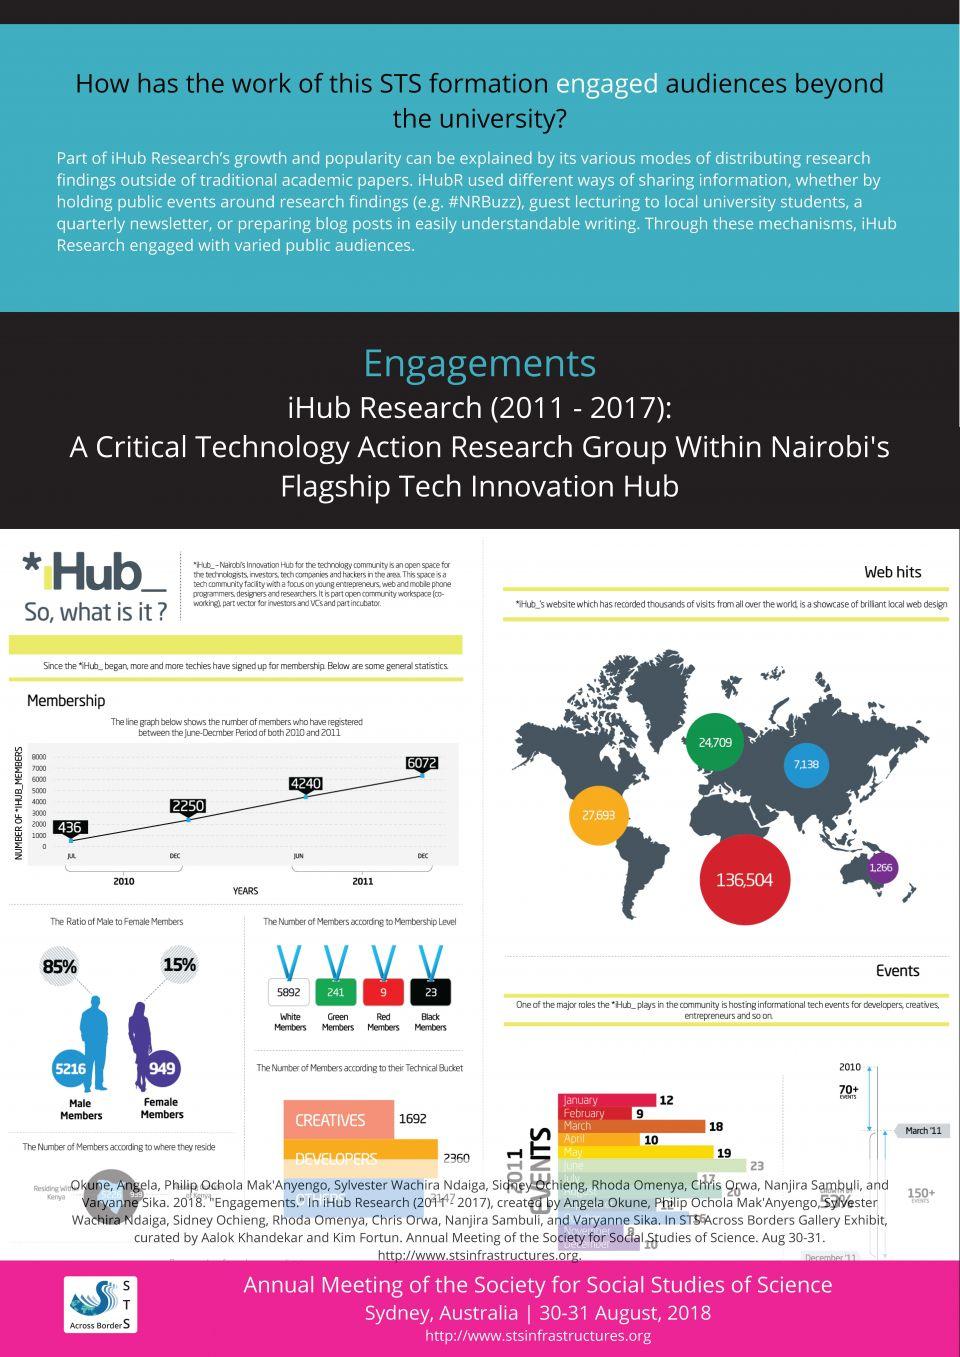 iHub Engagements